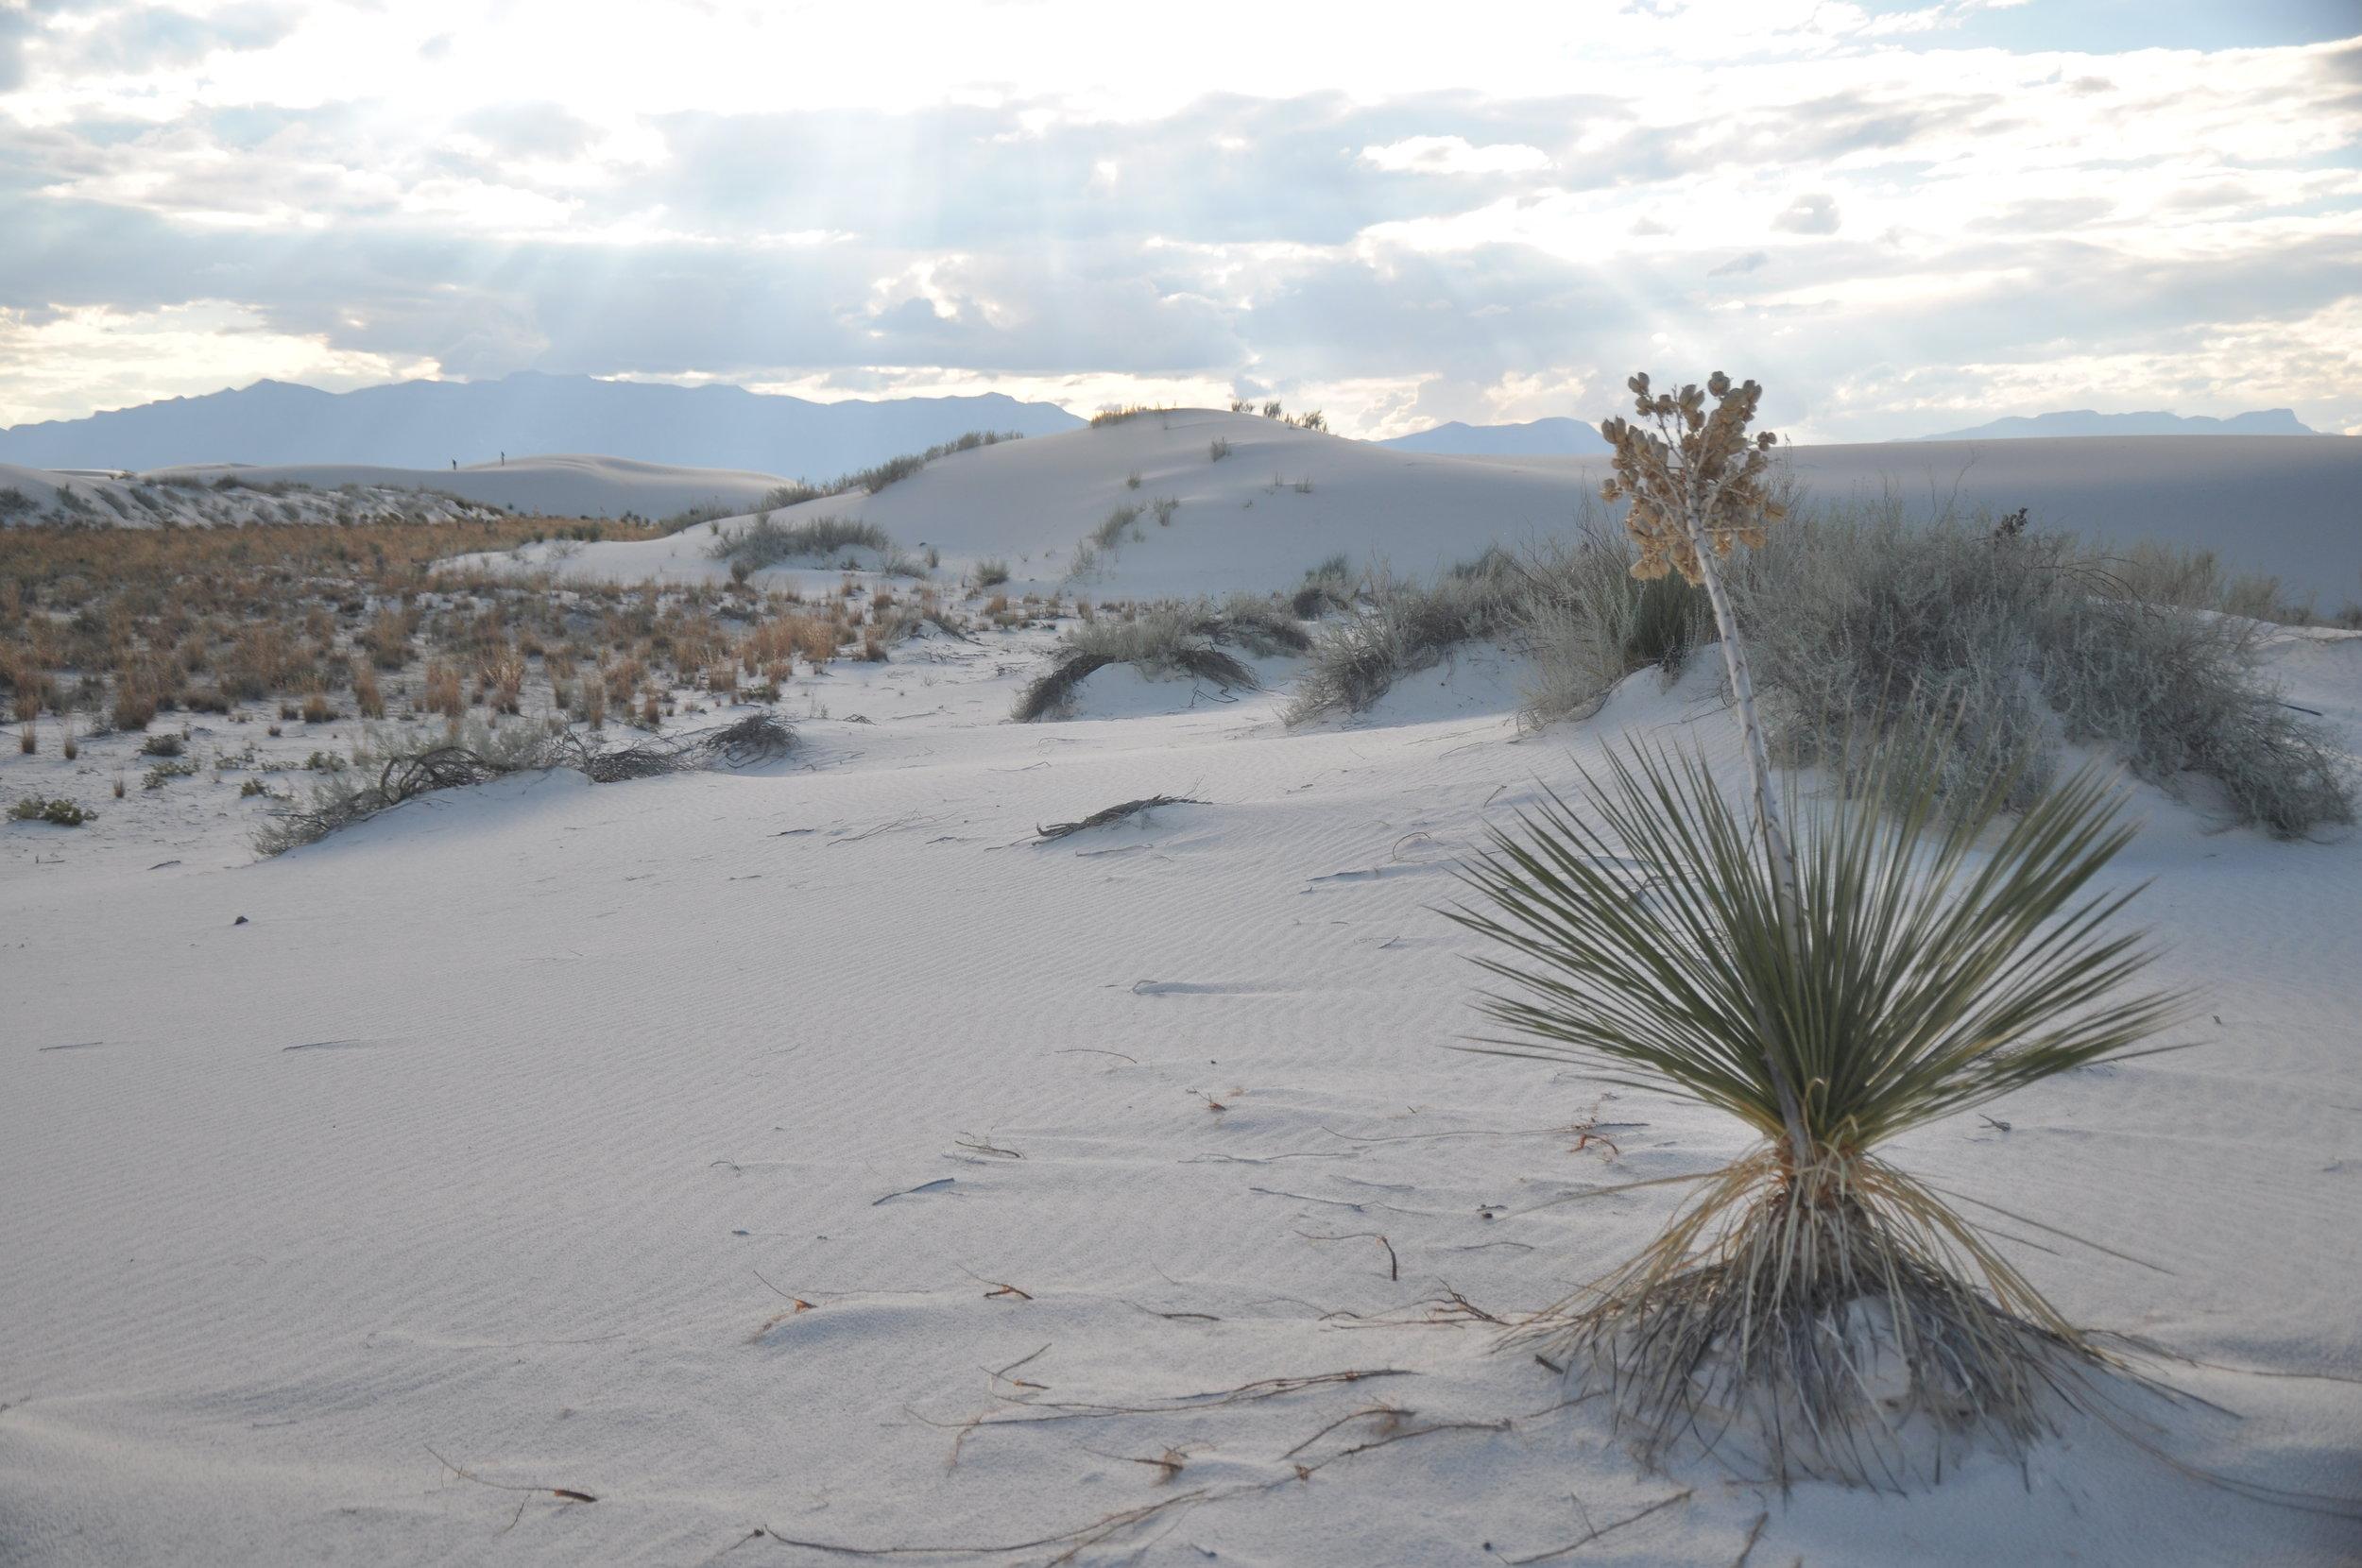 White Sands by Alamogordo